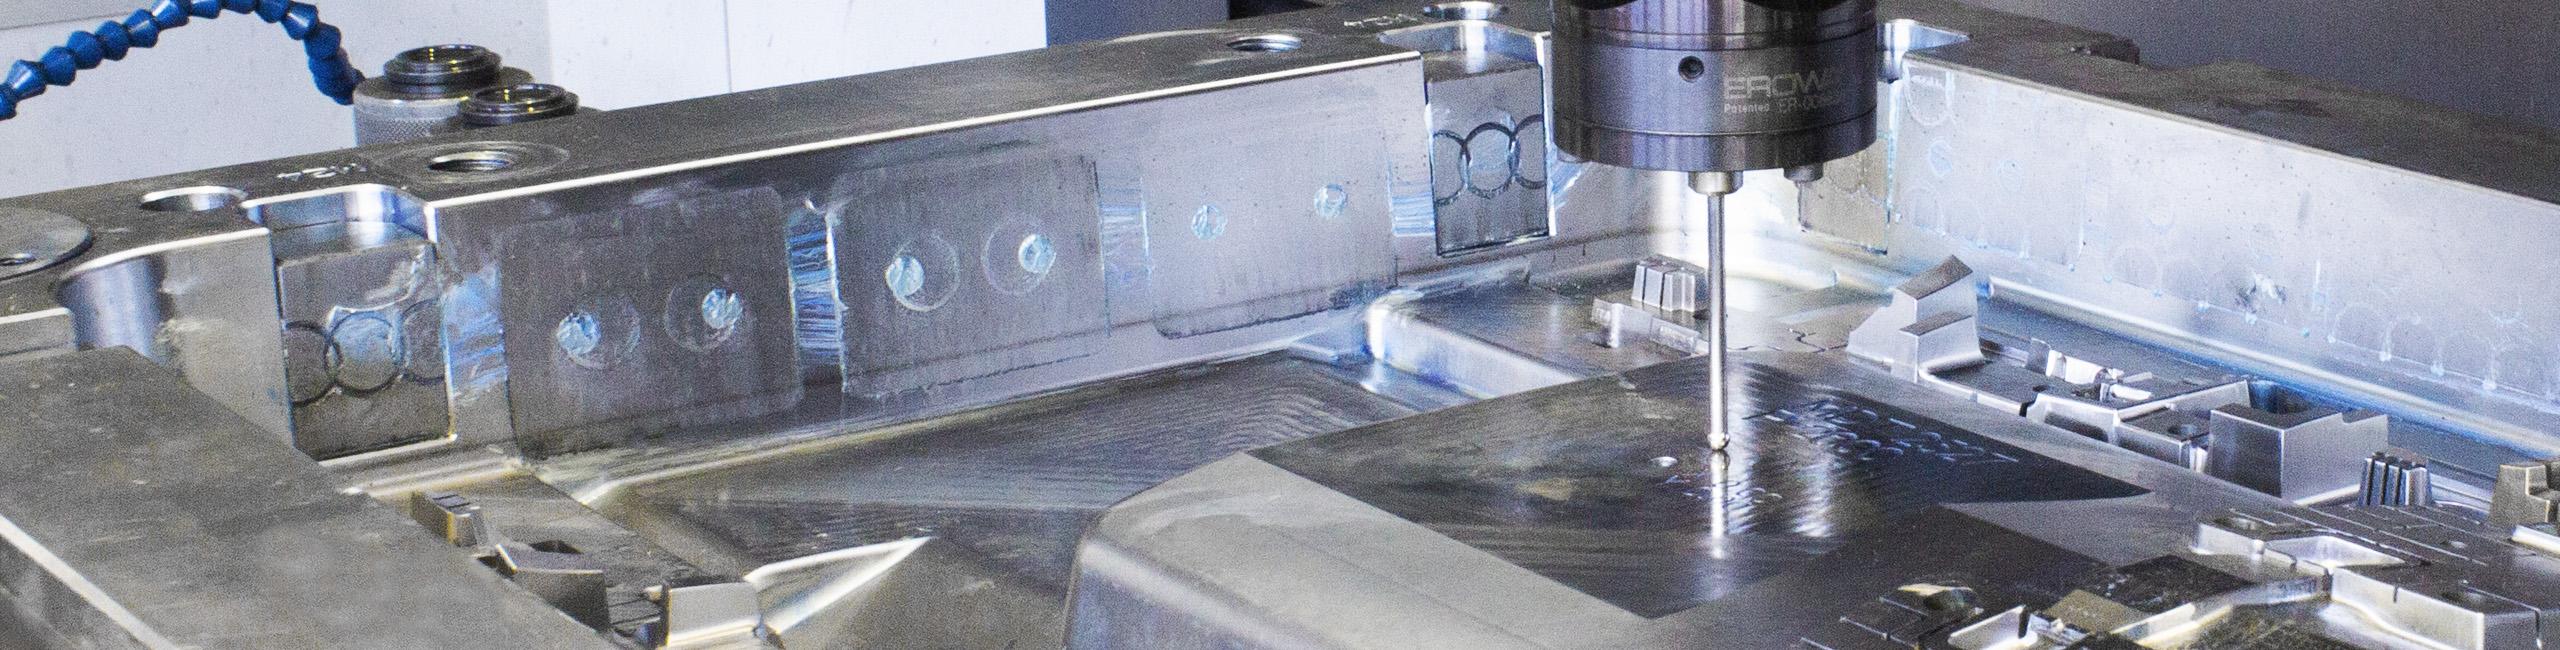 steel mold in EDM machine